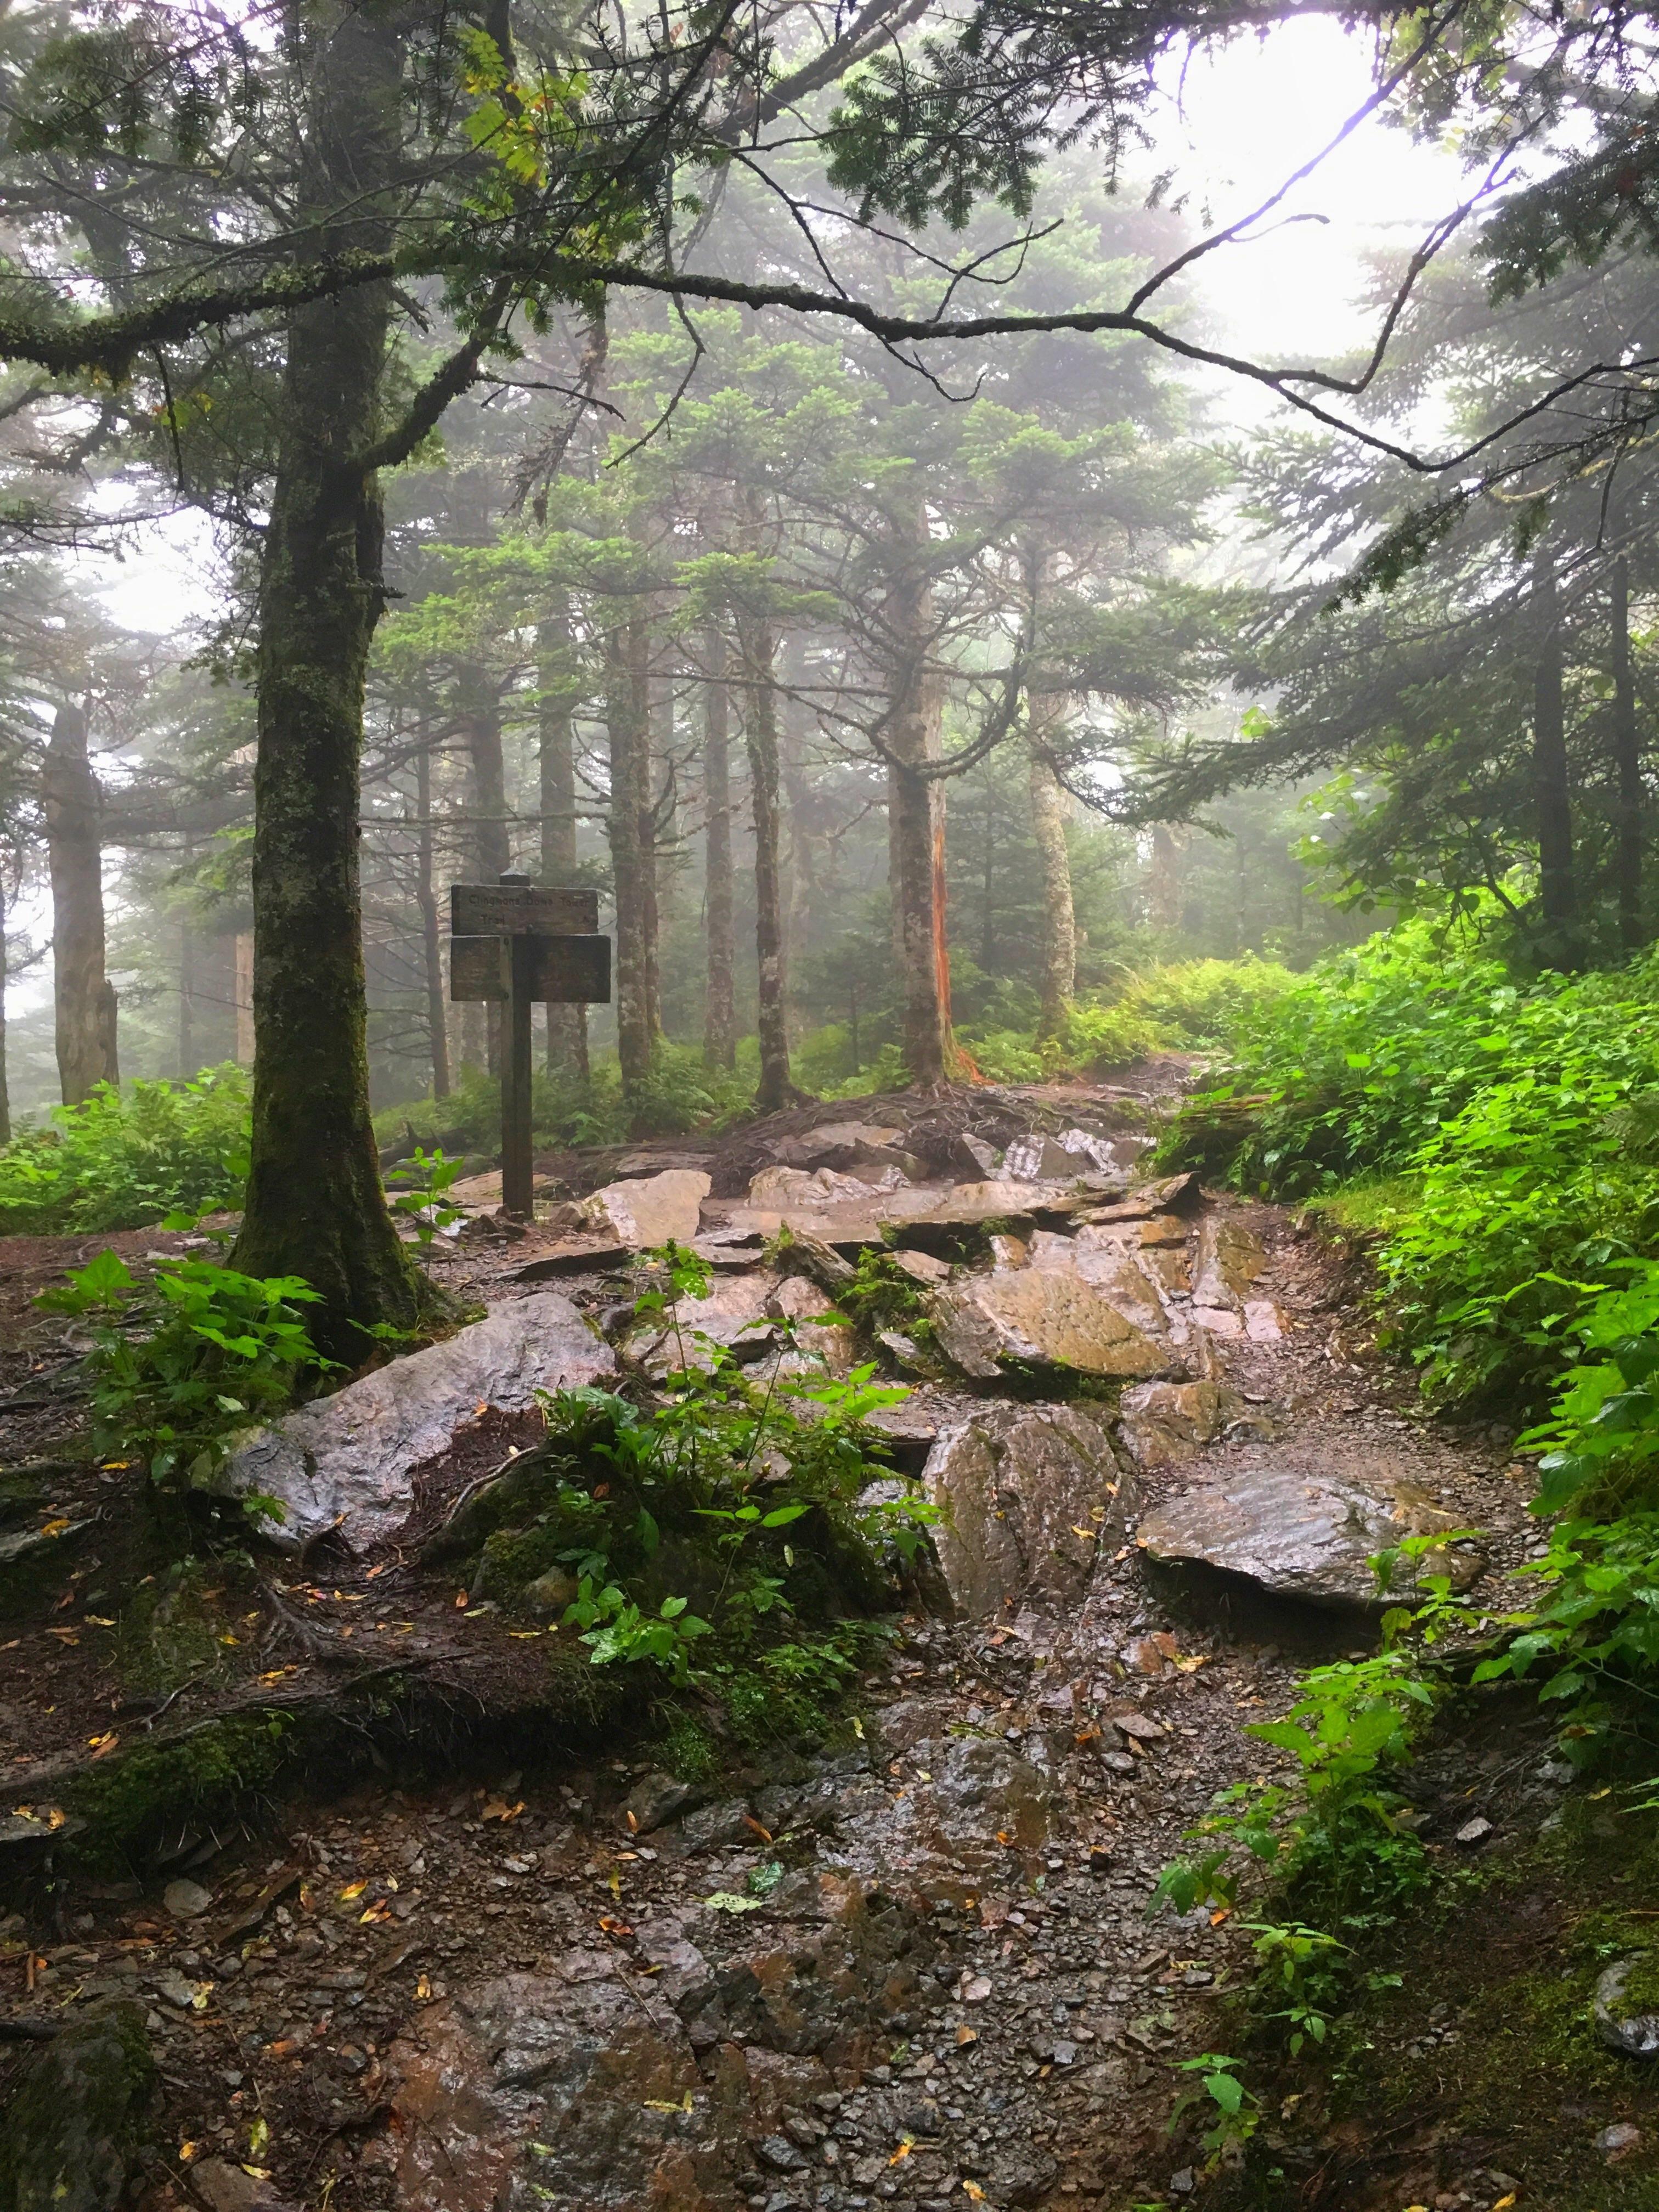 Appalachian Trail Near Clingmans Dome Tn Nc Usa Hiking Camping Outdoors Nature Travel Backpacking Appalachian Trail Hiking Appalachian Trail Hiking Usa